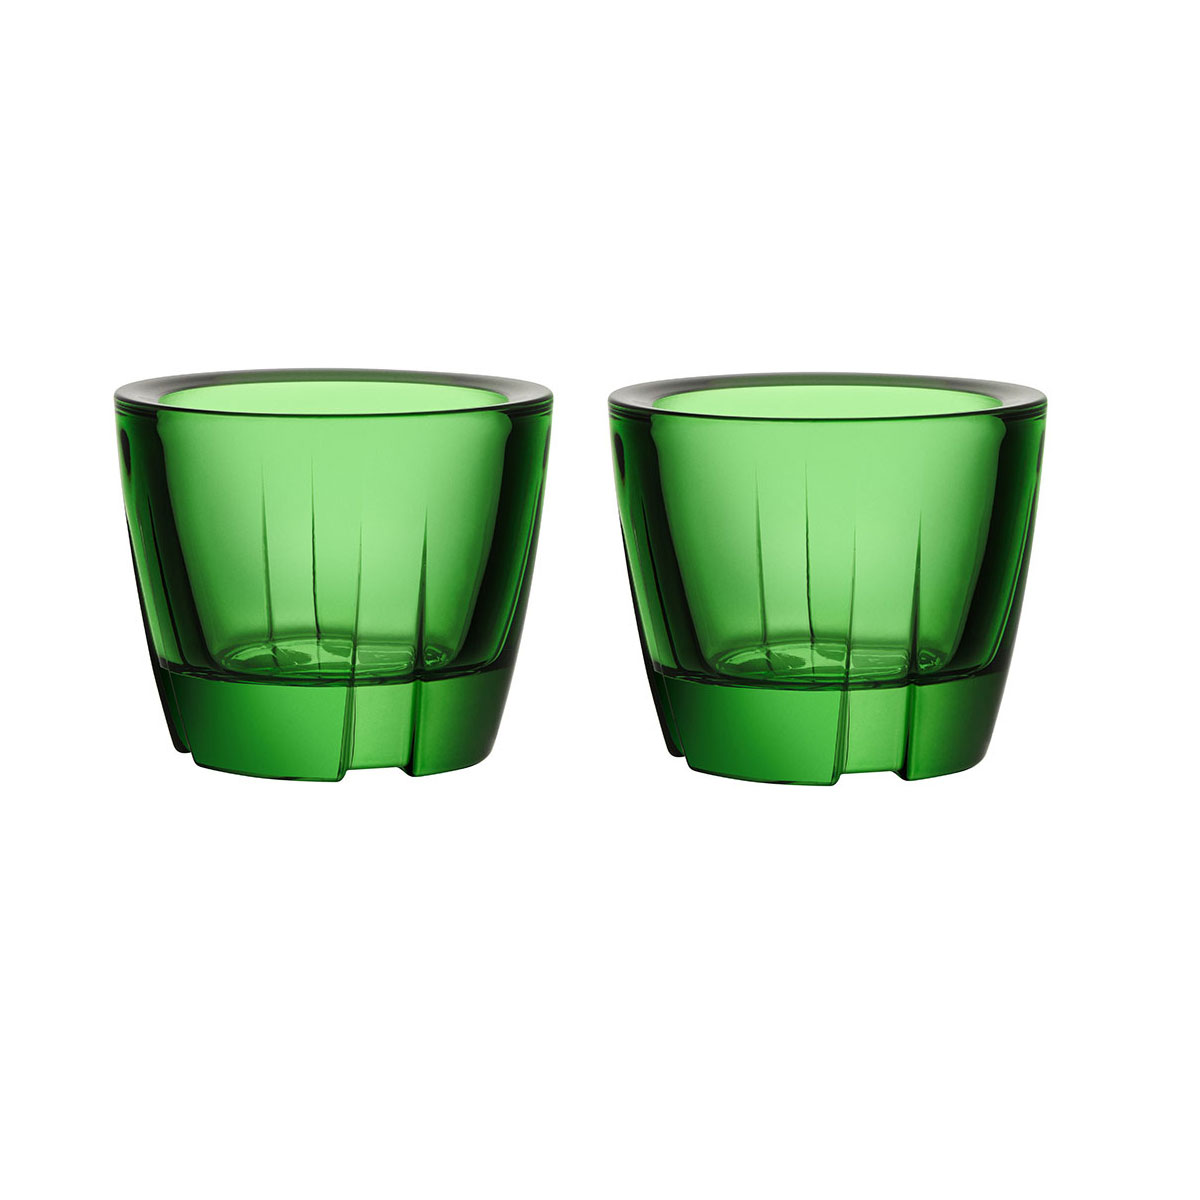 Kosta Boda Bruk Crystal Votive Apple Green Anything Crystal Bowl, Pair